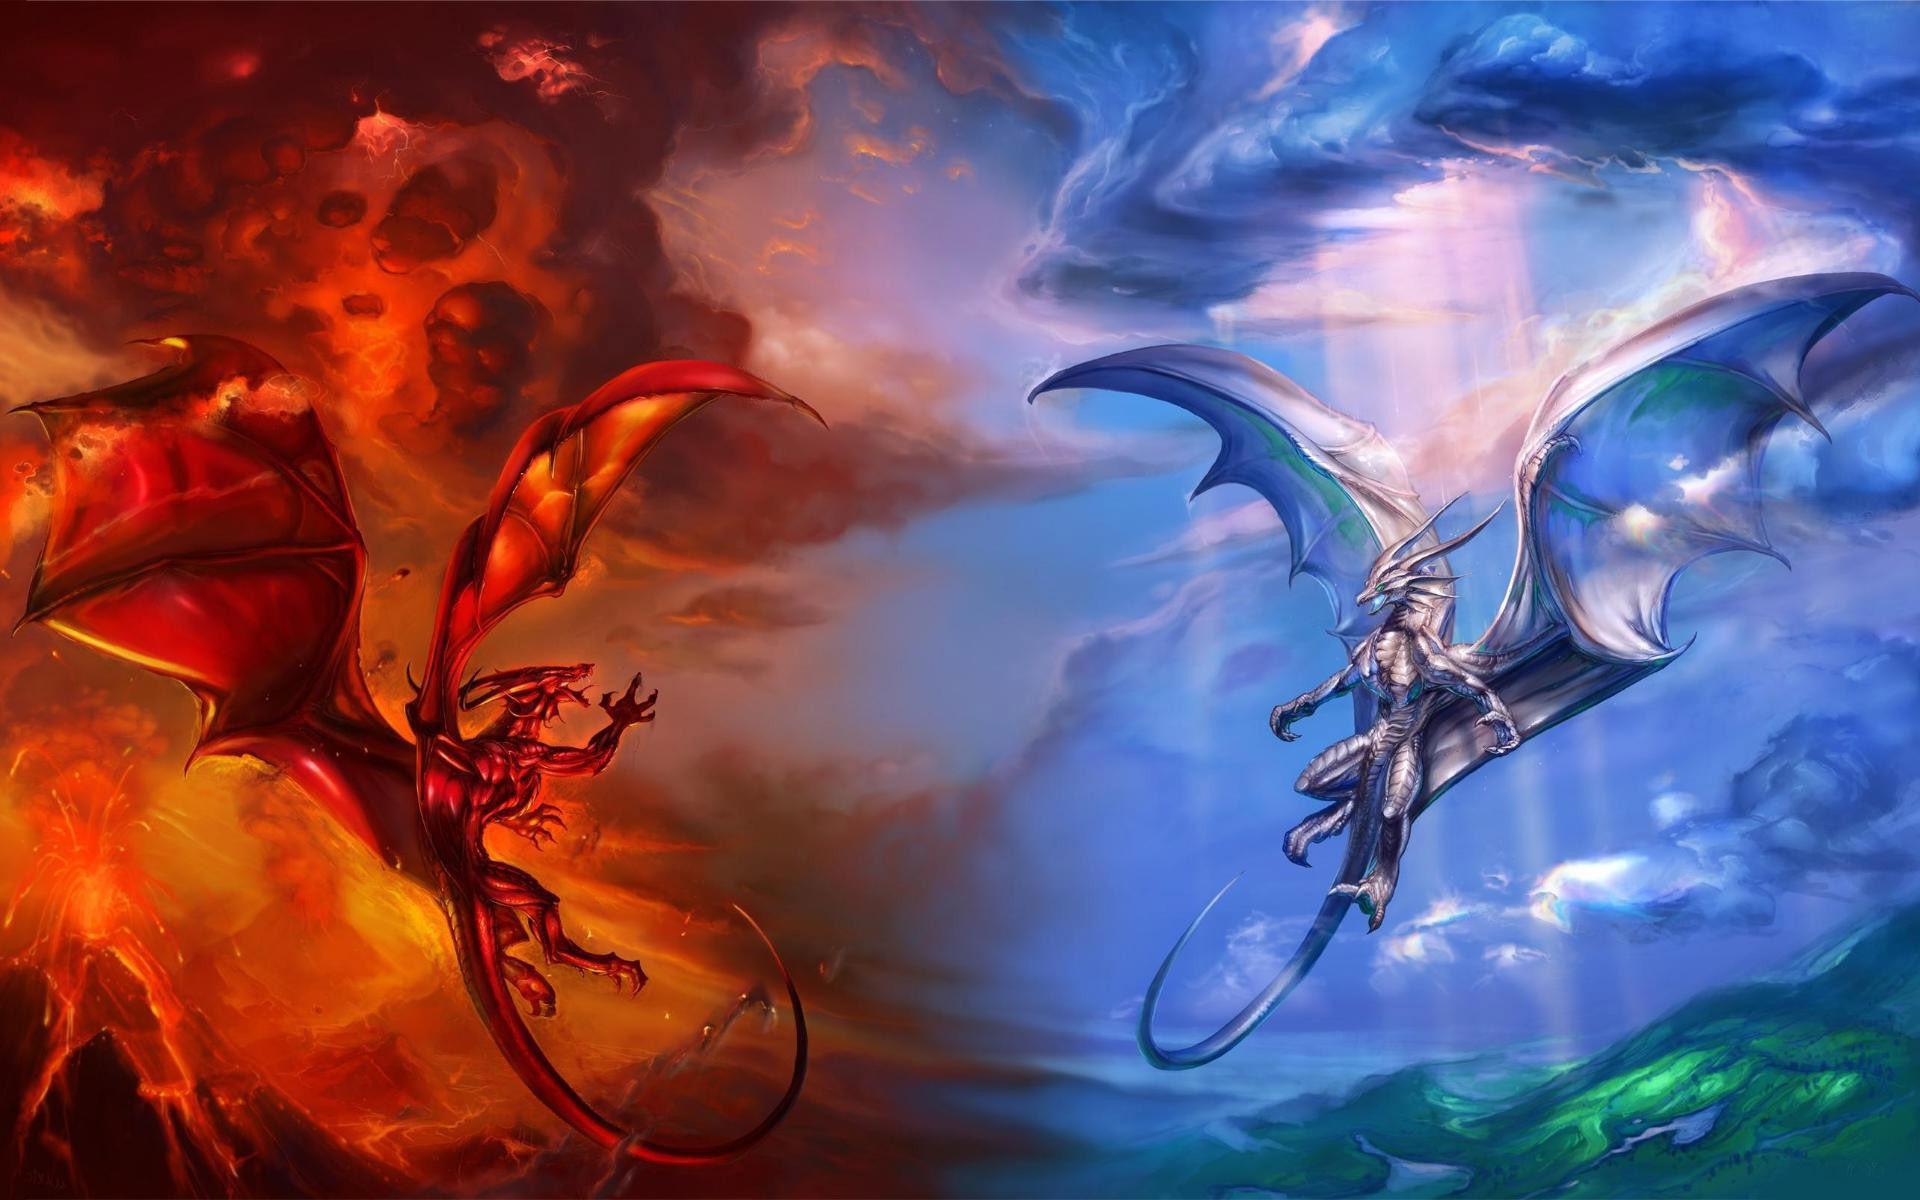 Ice Fire Dragon Wallpaper Hd - Fire Dragon And Ice Dragon - HD Wallpaper